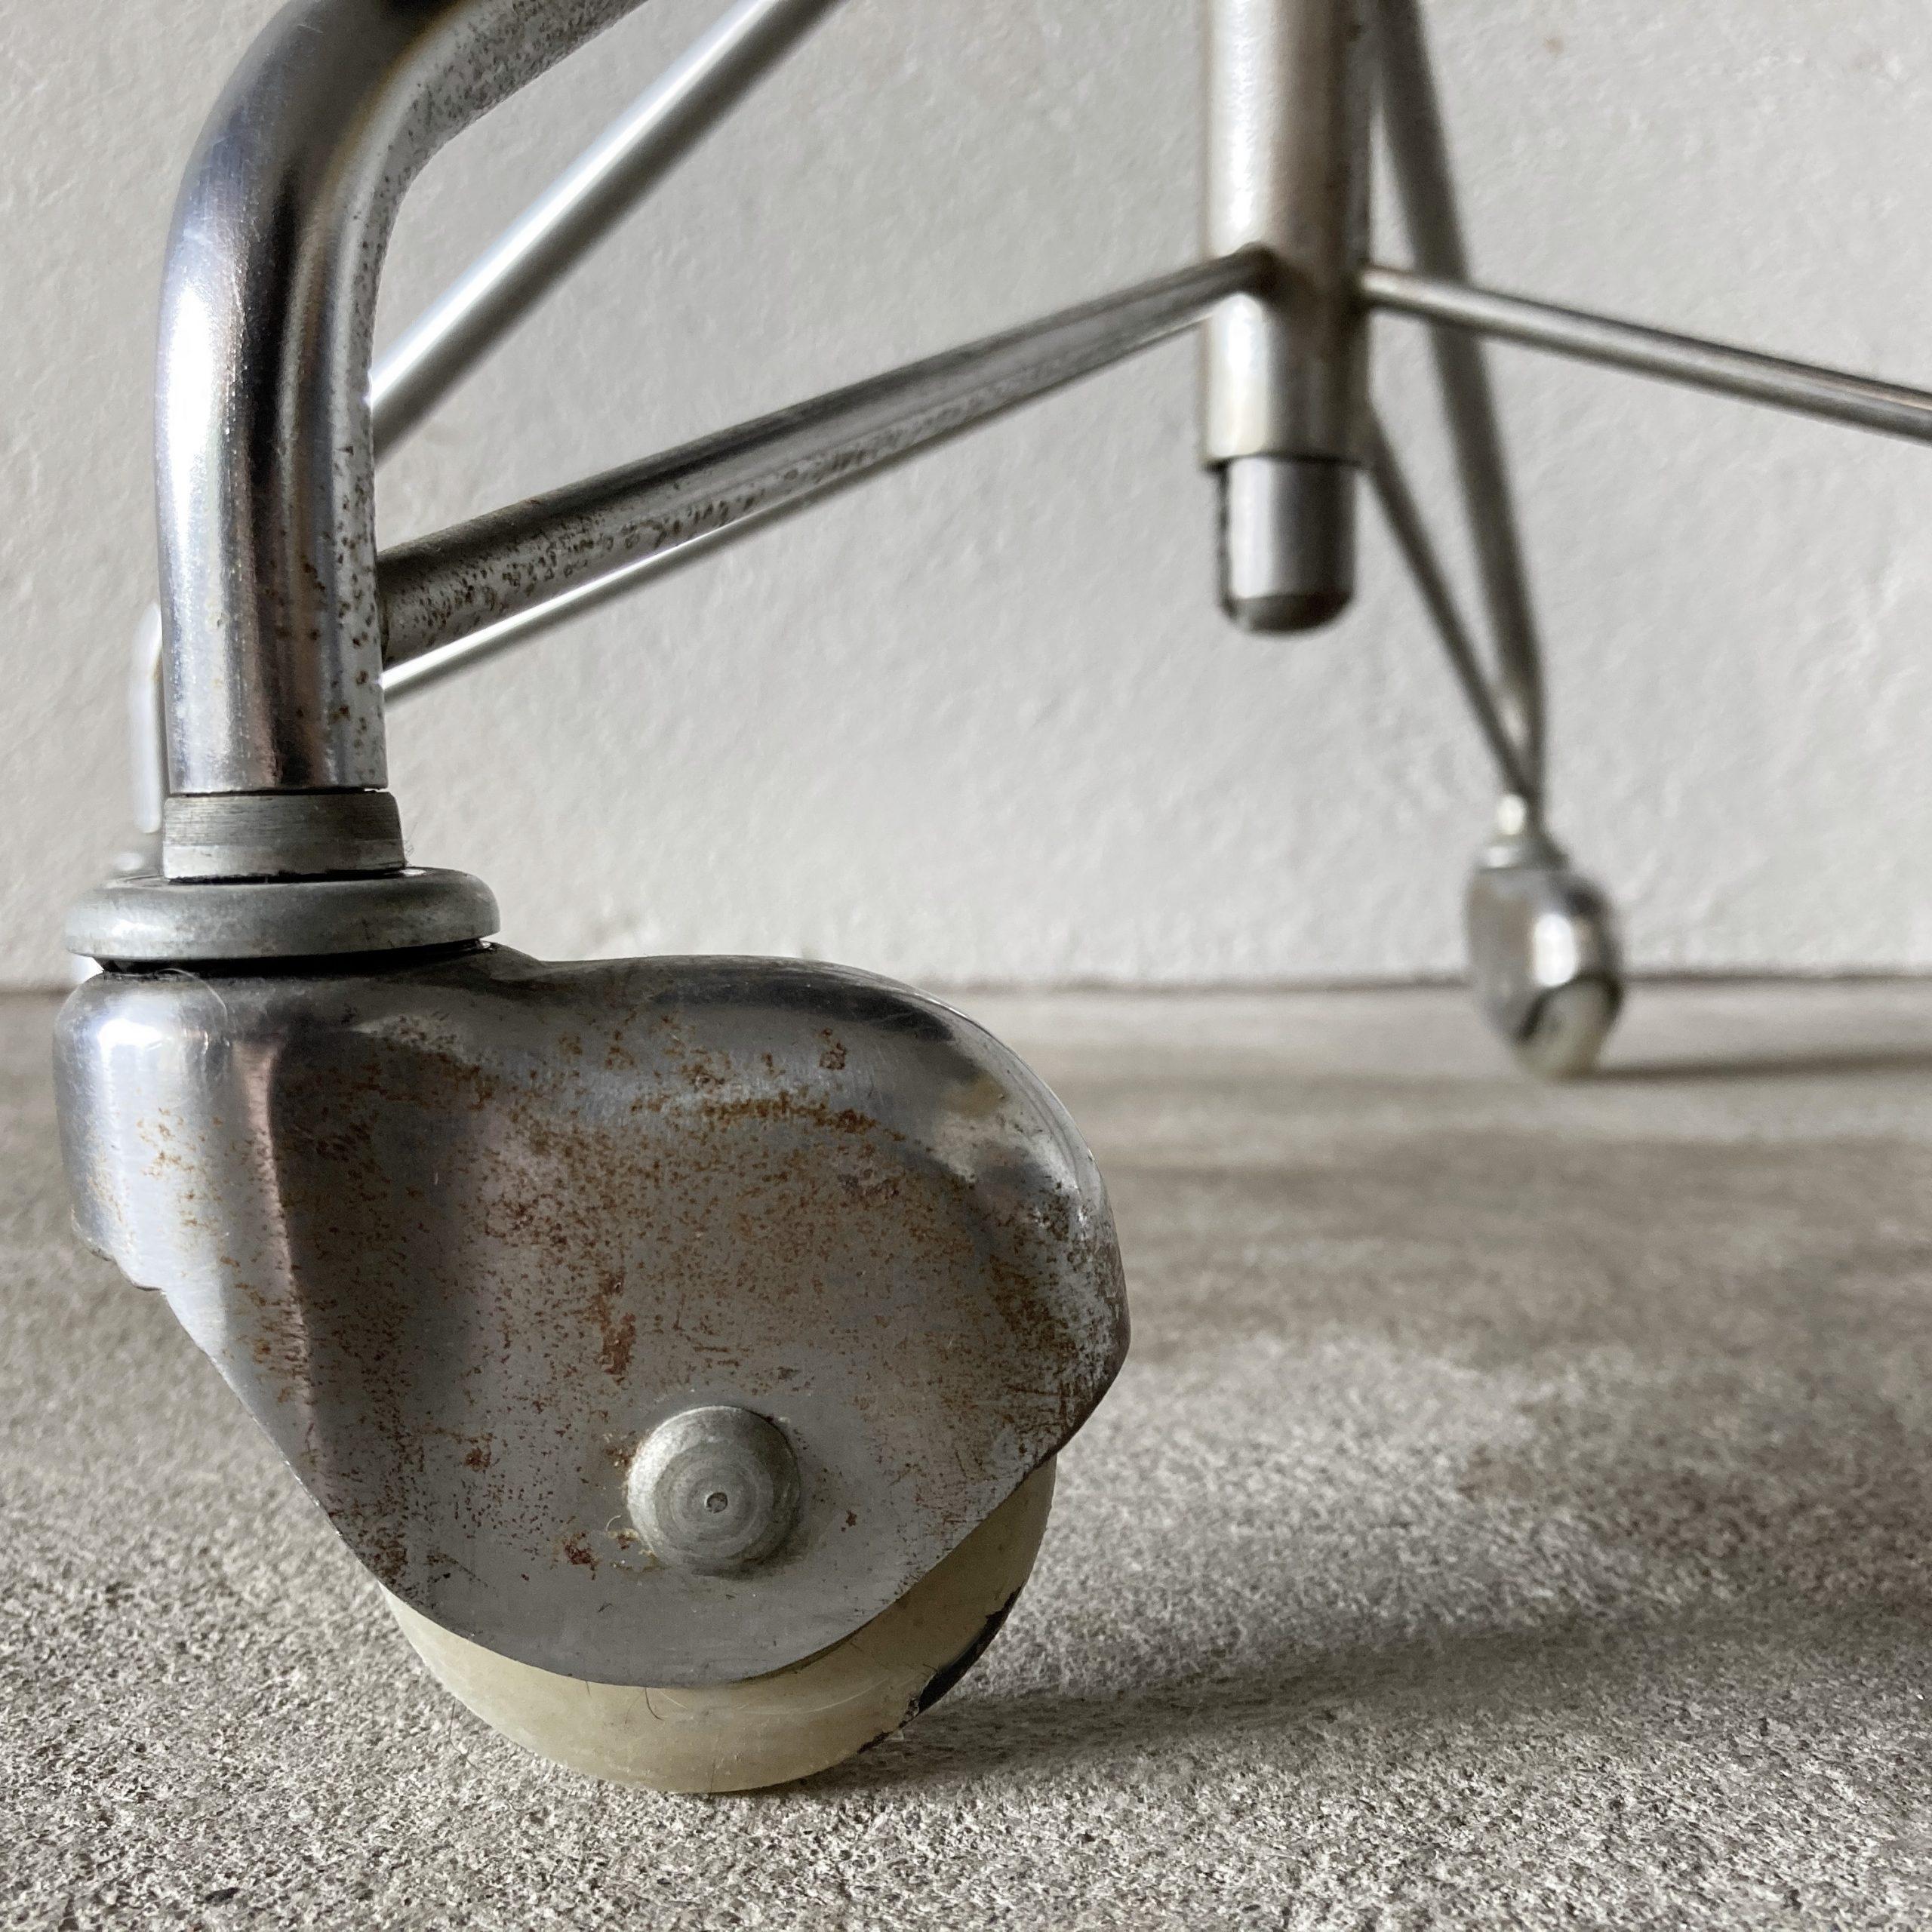 swivel-desk-chair-3113-by-arne-jacobsen-1964-image-03